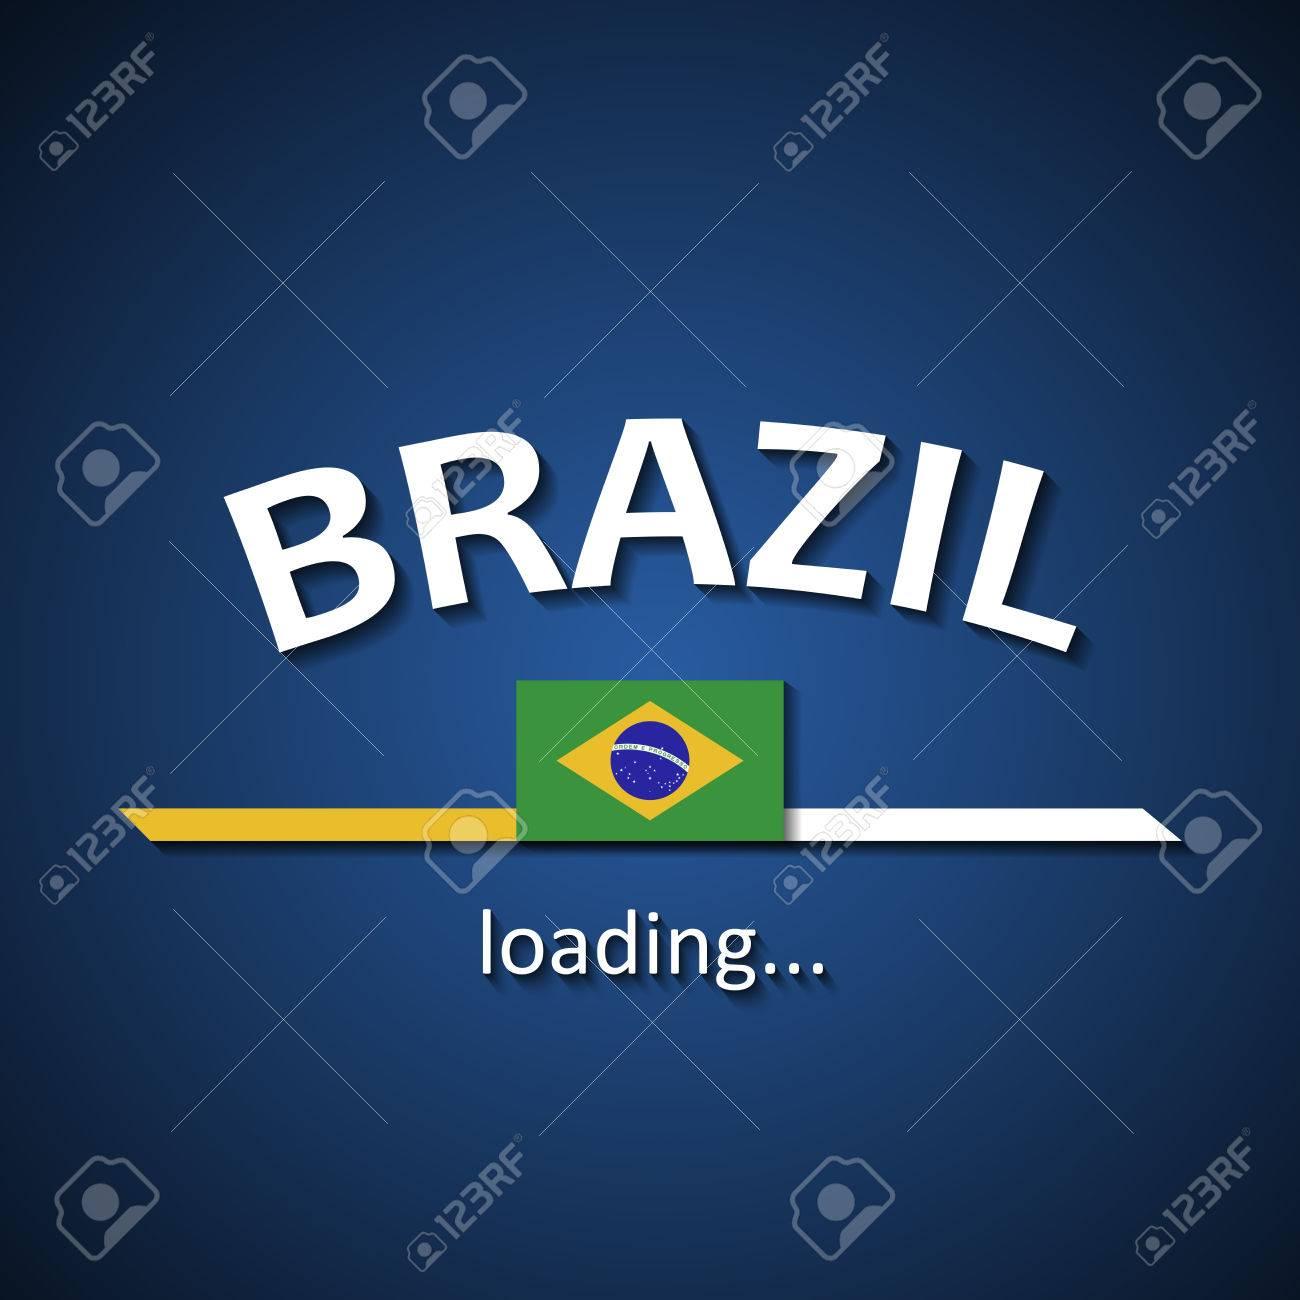 Brazilian flag loading bar - tourism banner for travel agencies